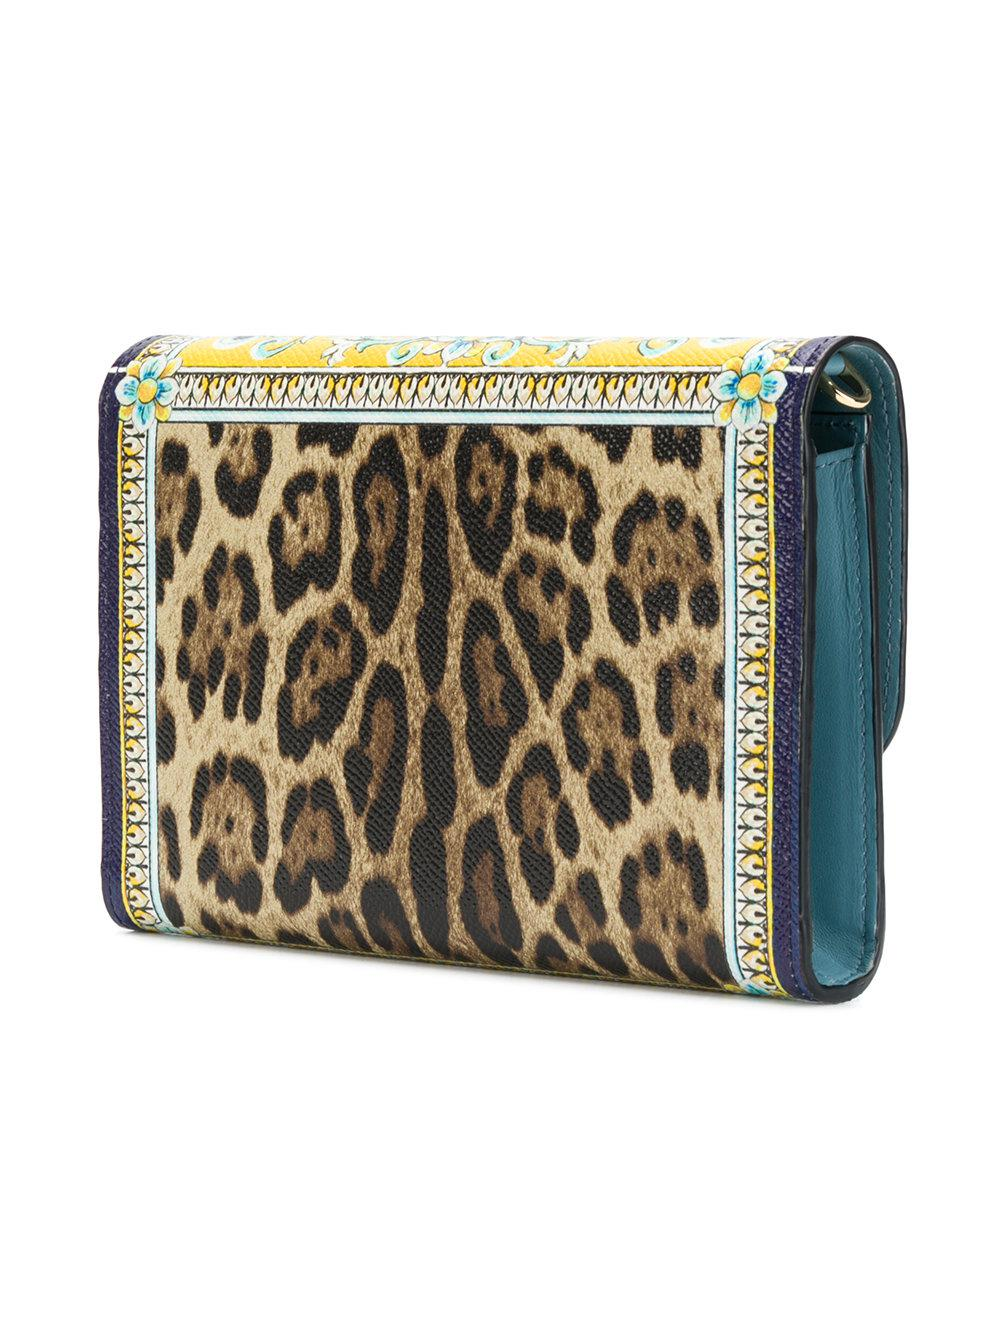 Majolica and Leopard print wallet on a chain - Multicolour Dolce & Gabbana 5f2AlB